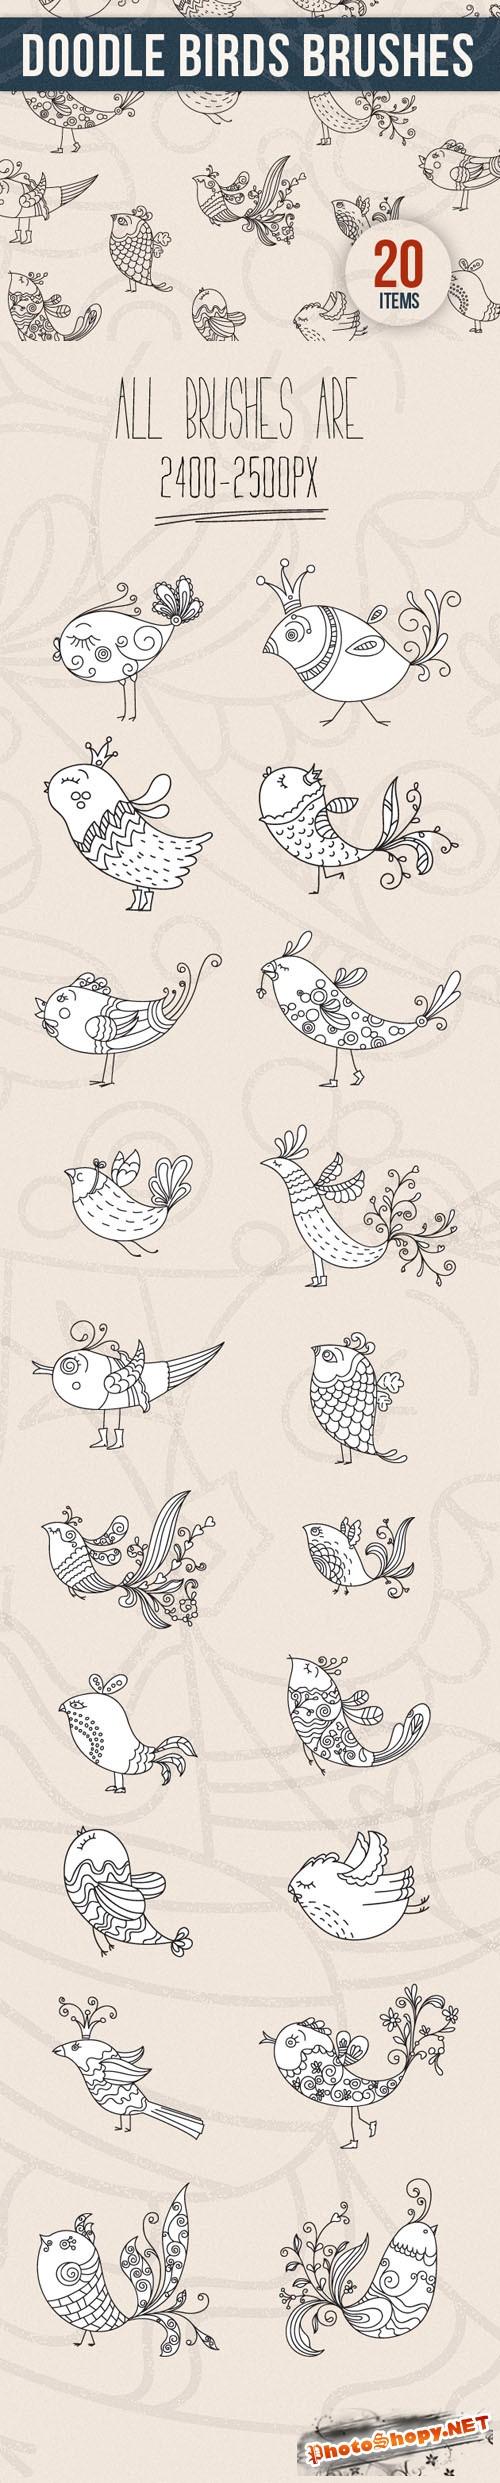 Designtnt - Doodle Birds PS Brushes